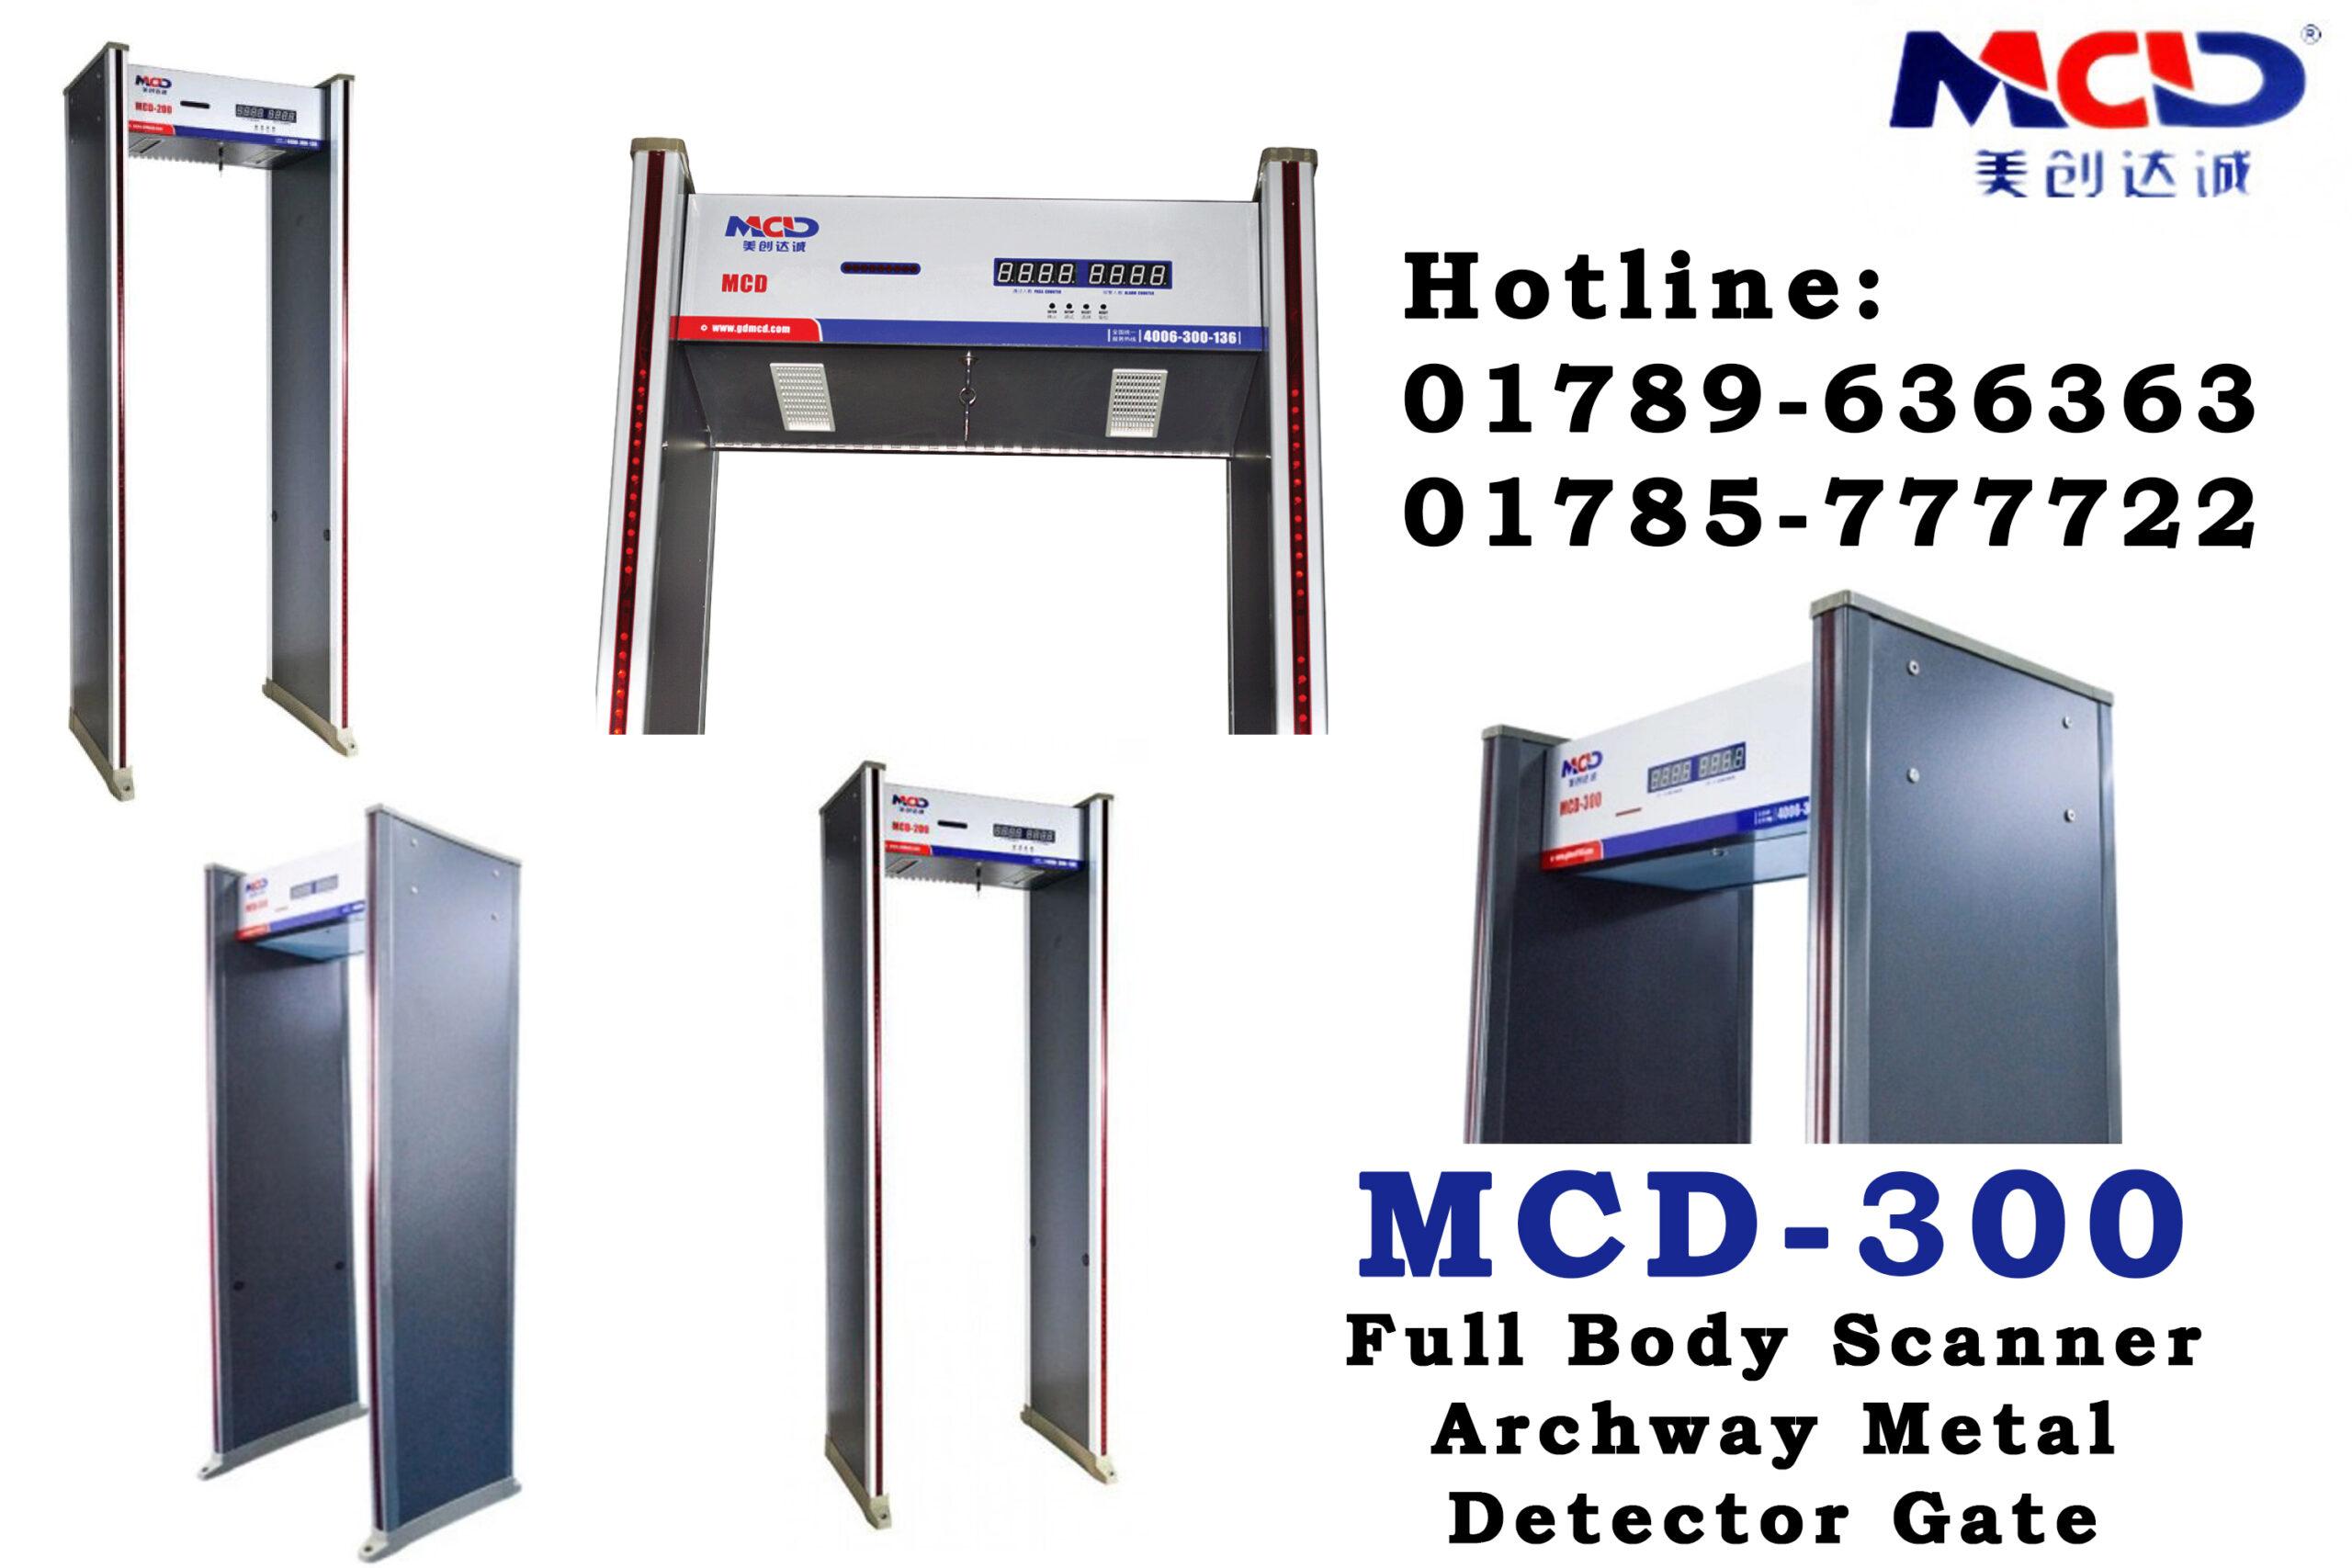 MCD300 in Bangladesh, Archway Gate MCD300 Walkthrough Metal Detector in Bangladesh